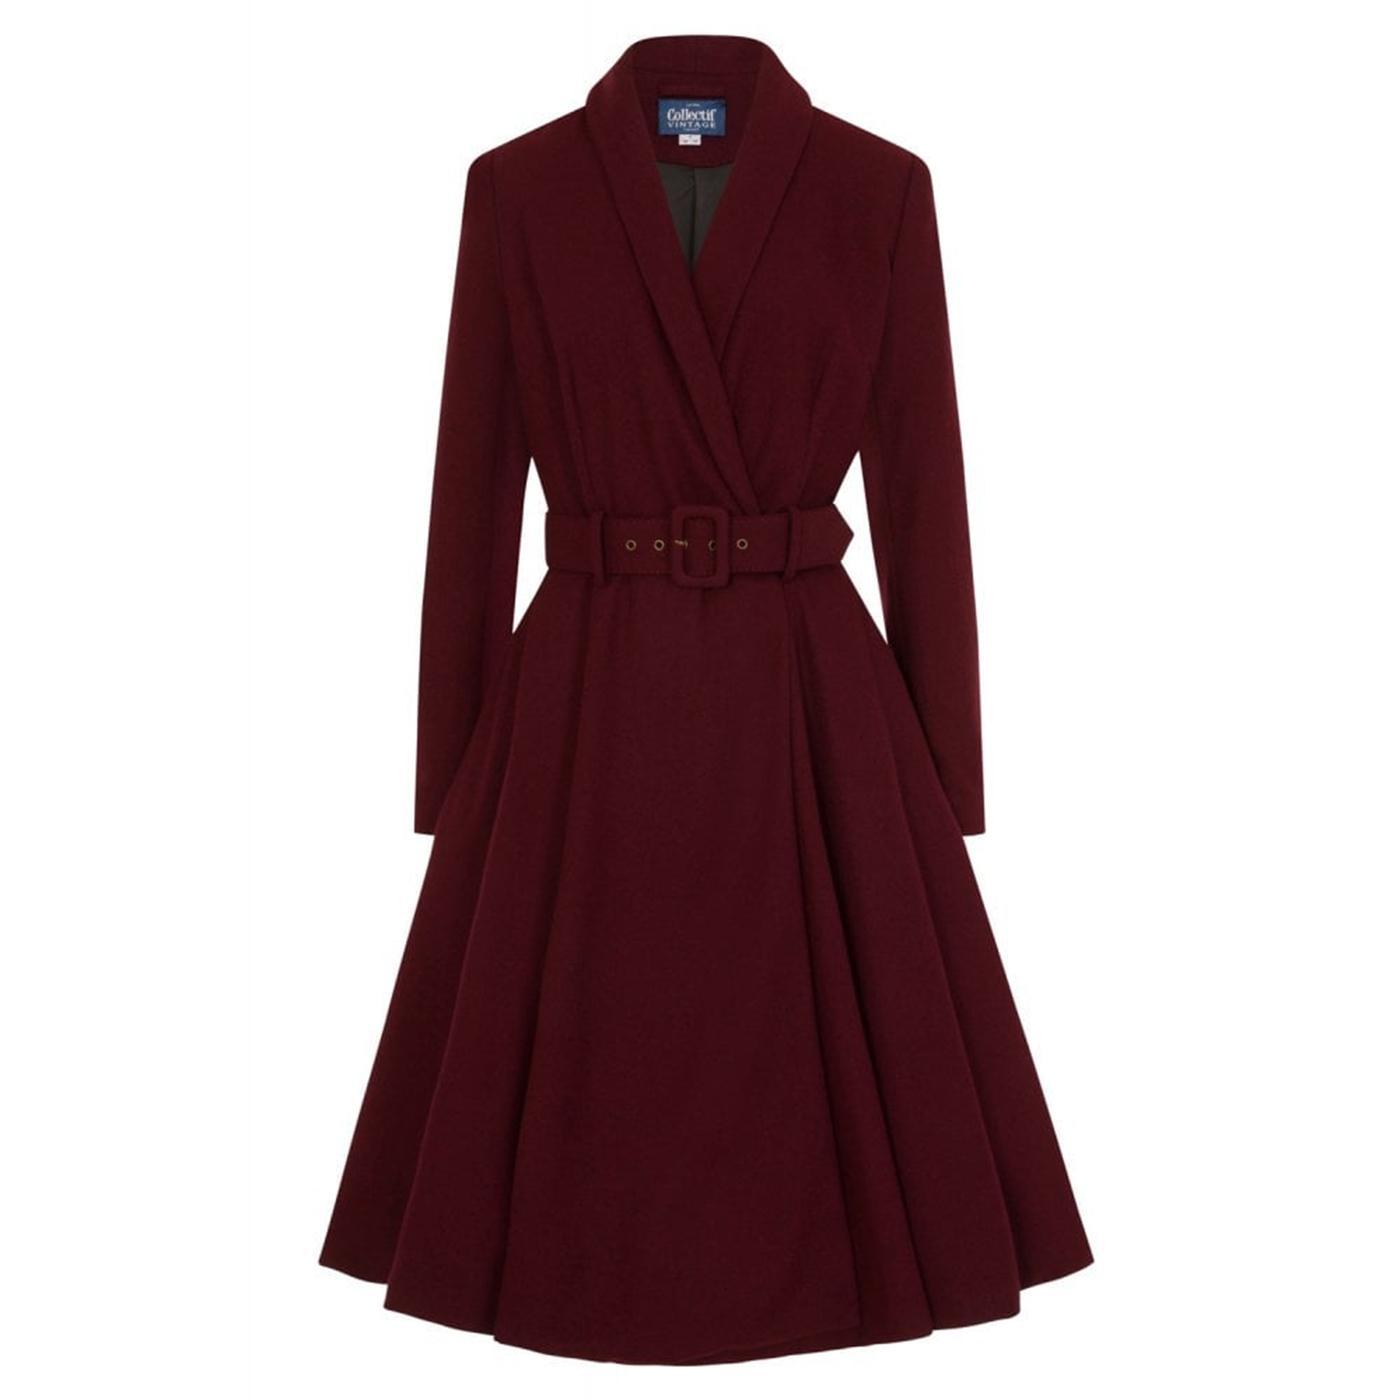 Dawn COLLECTIF Vintage 1950s Swing Coat In Wine